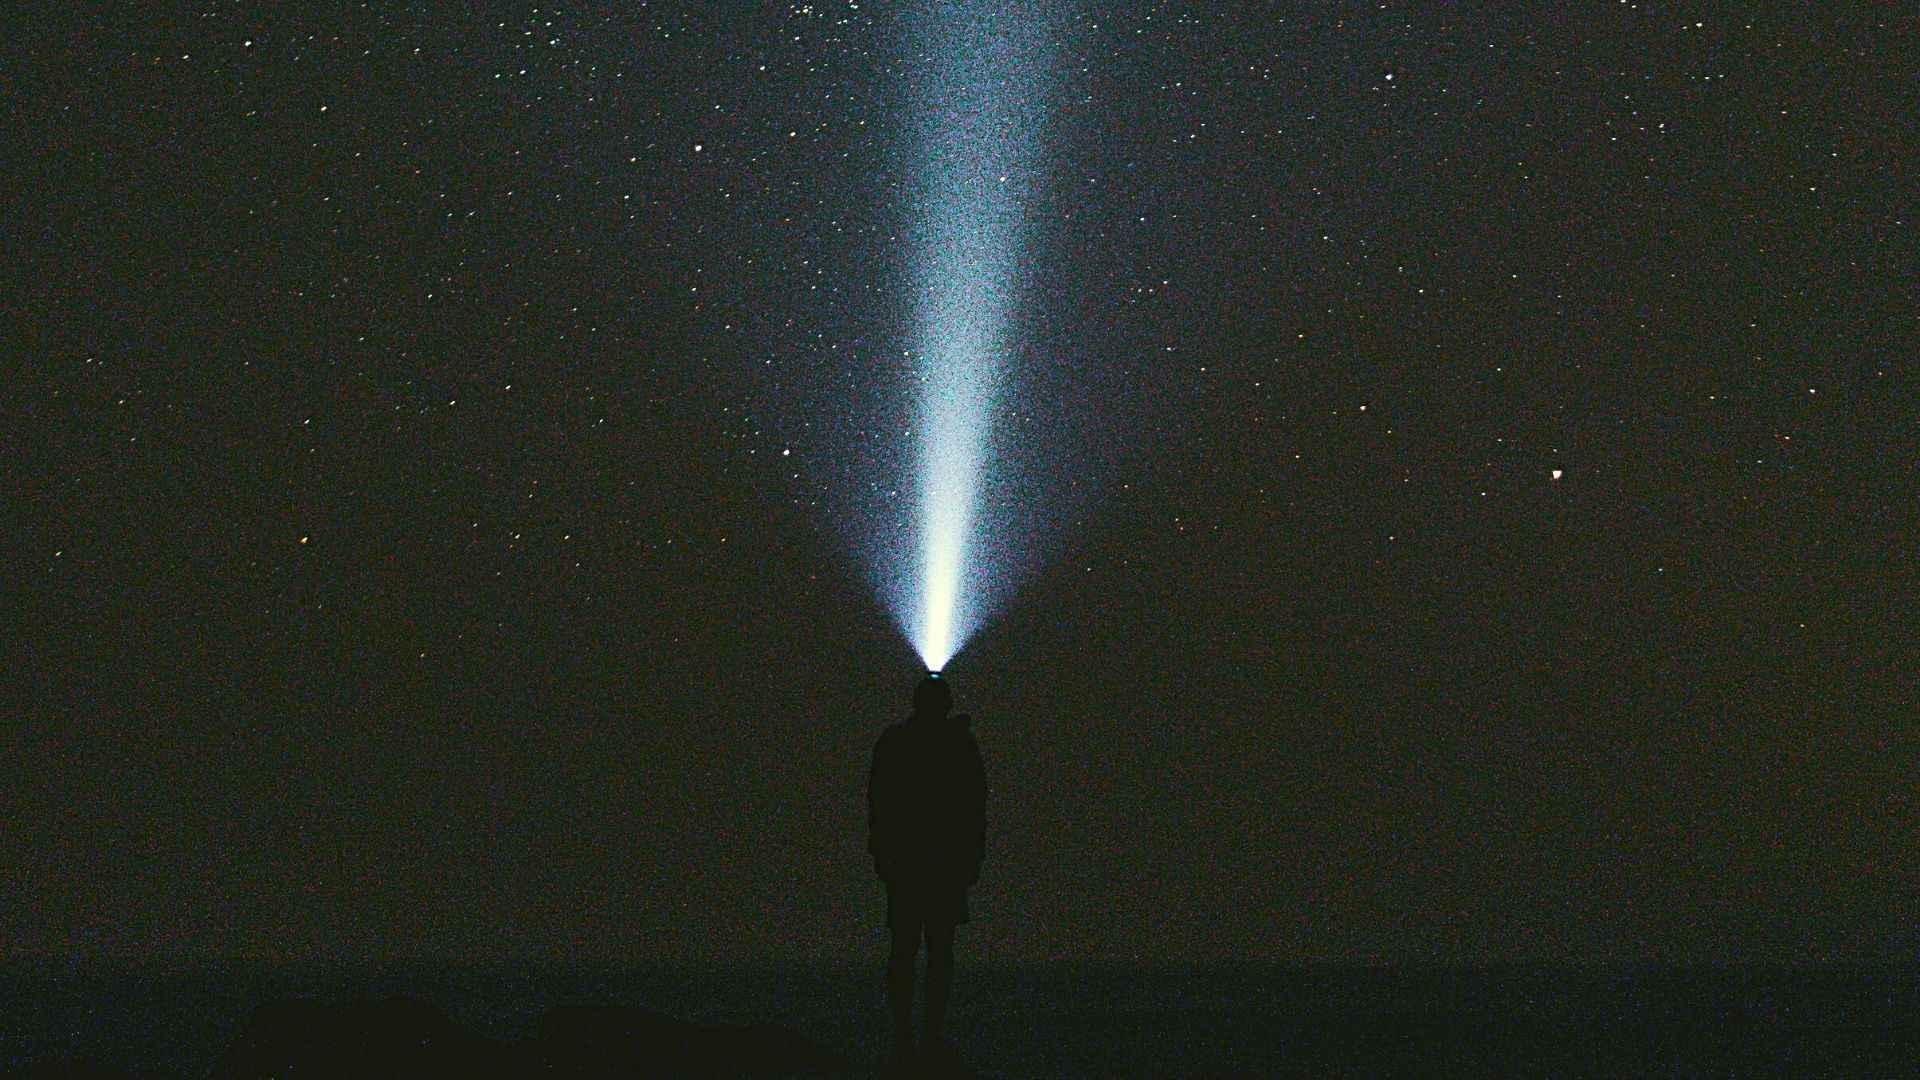 Headlamp in the night sky